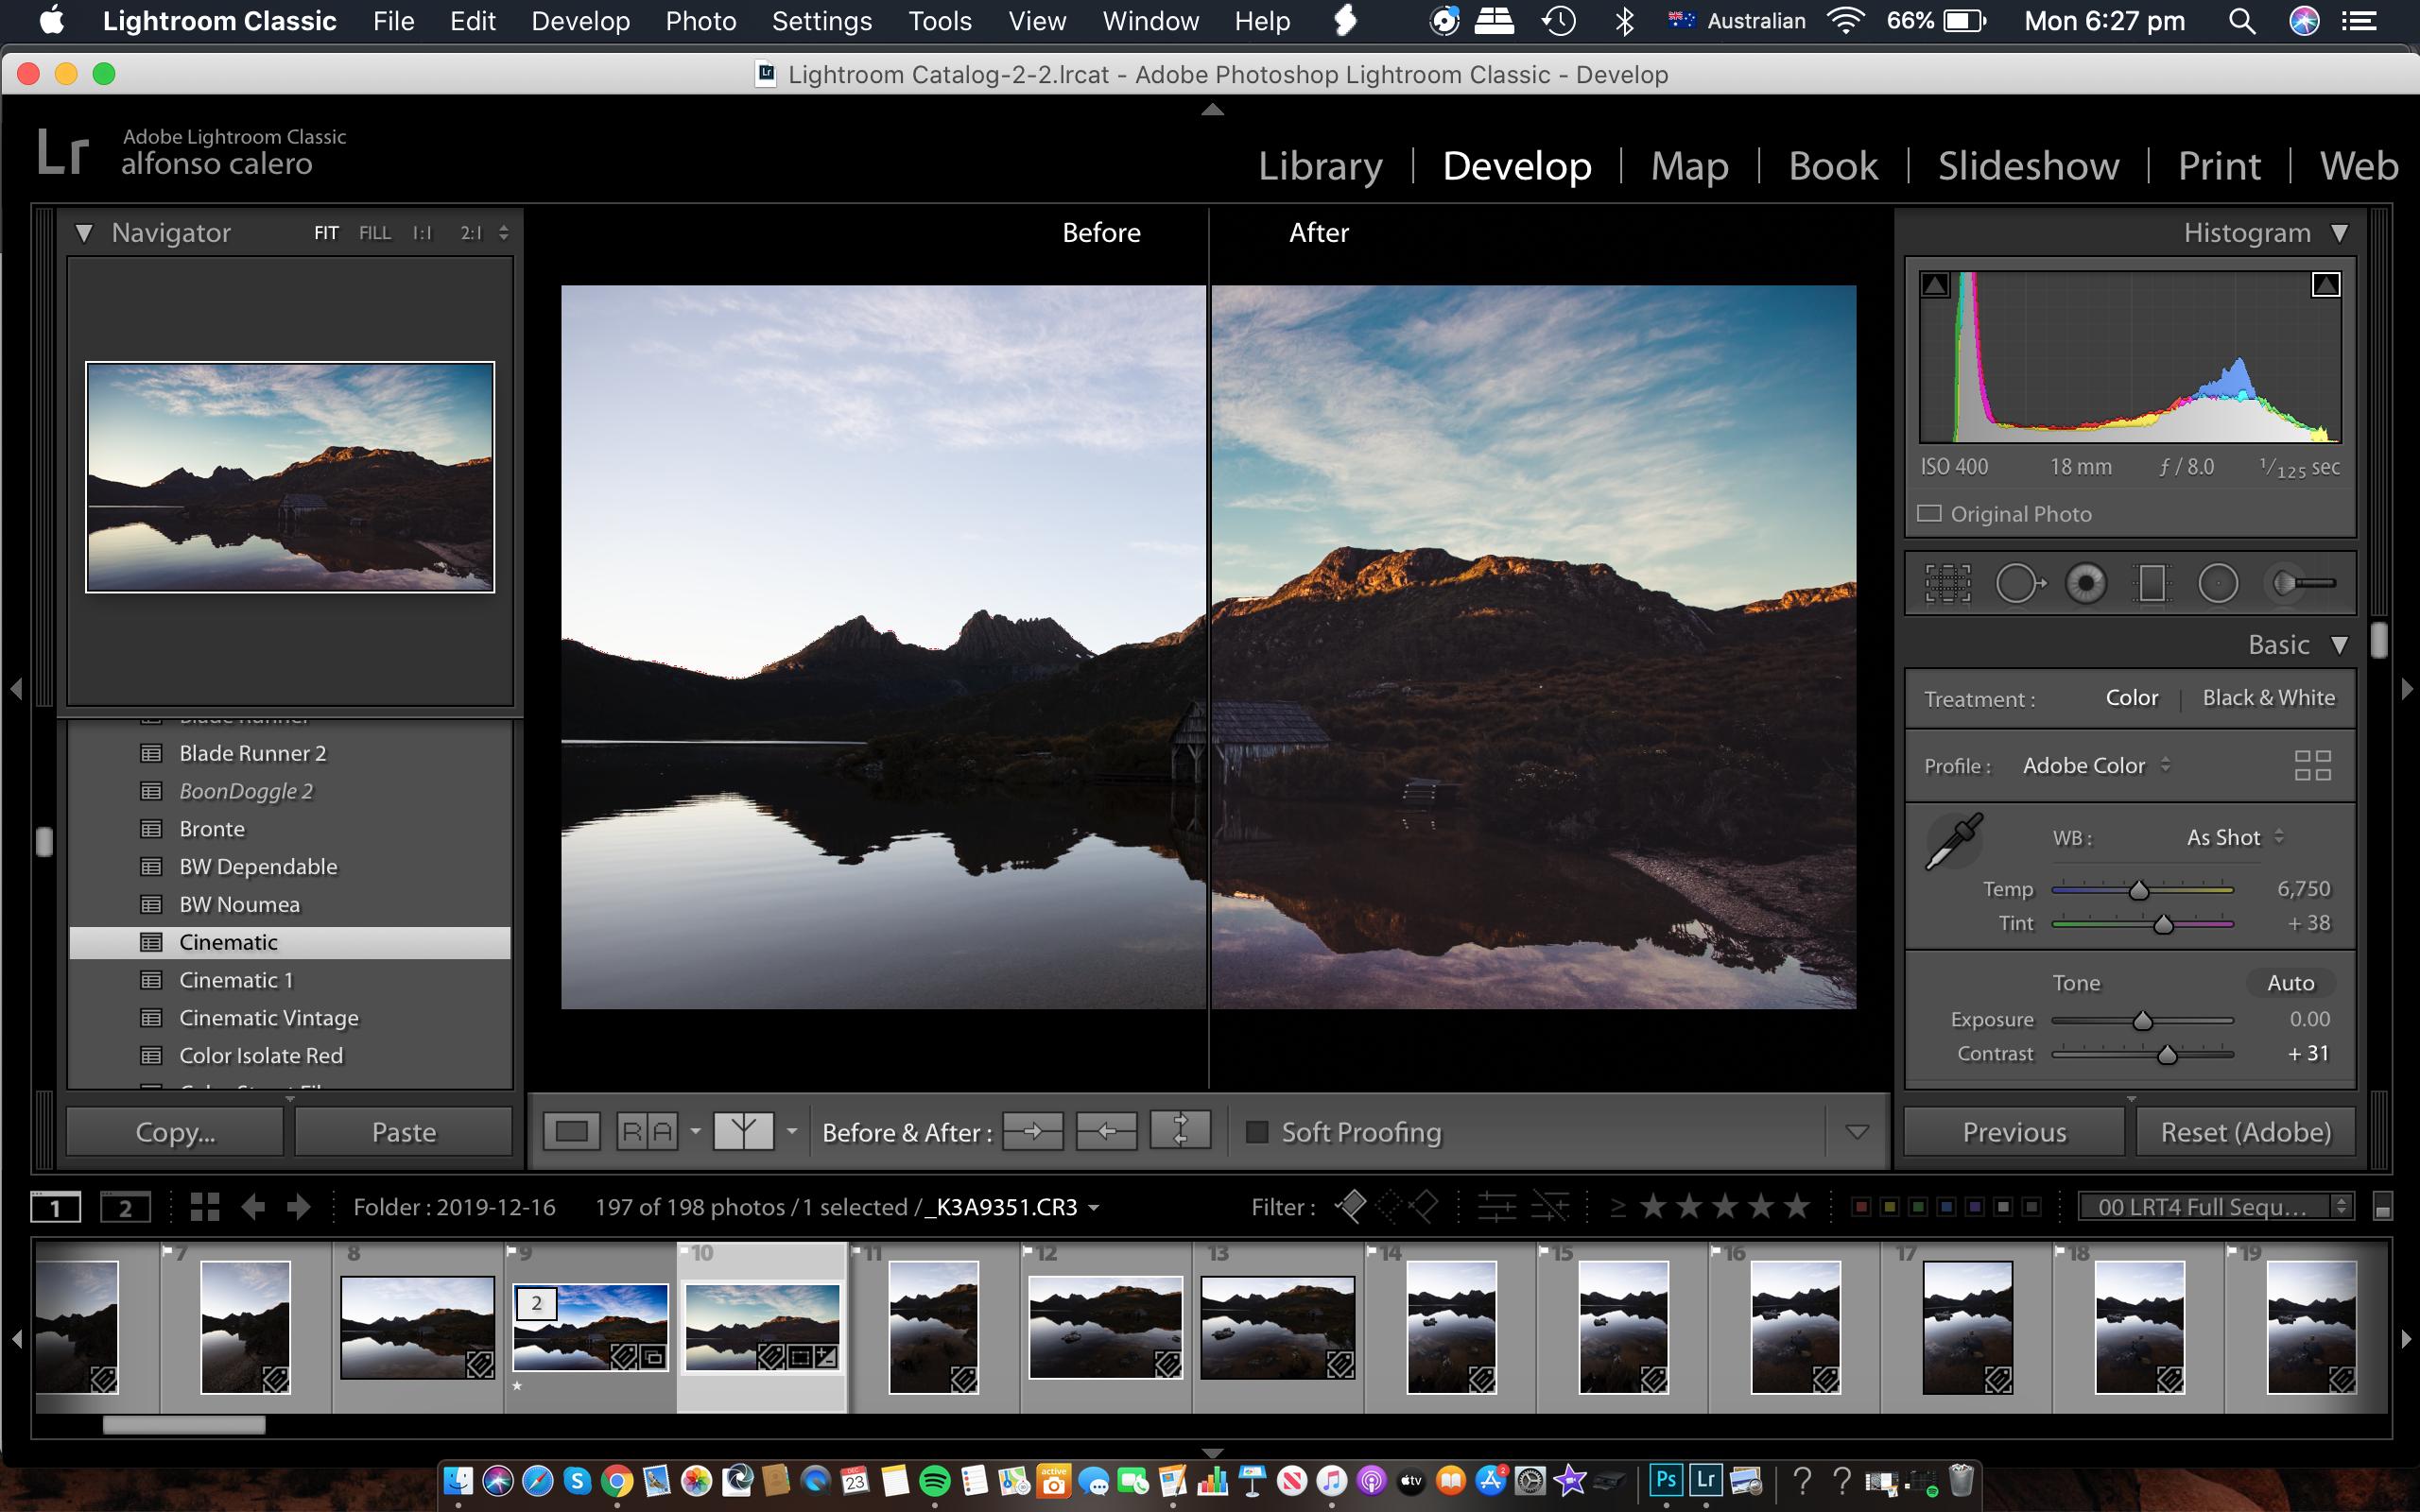 Adobe Lightroom Editing - Beginners